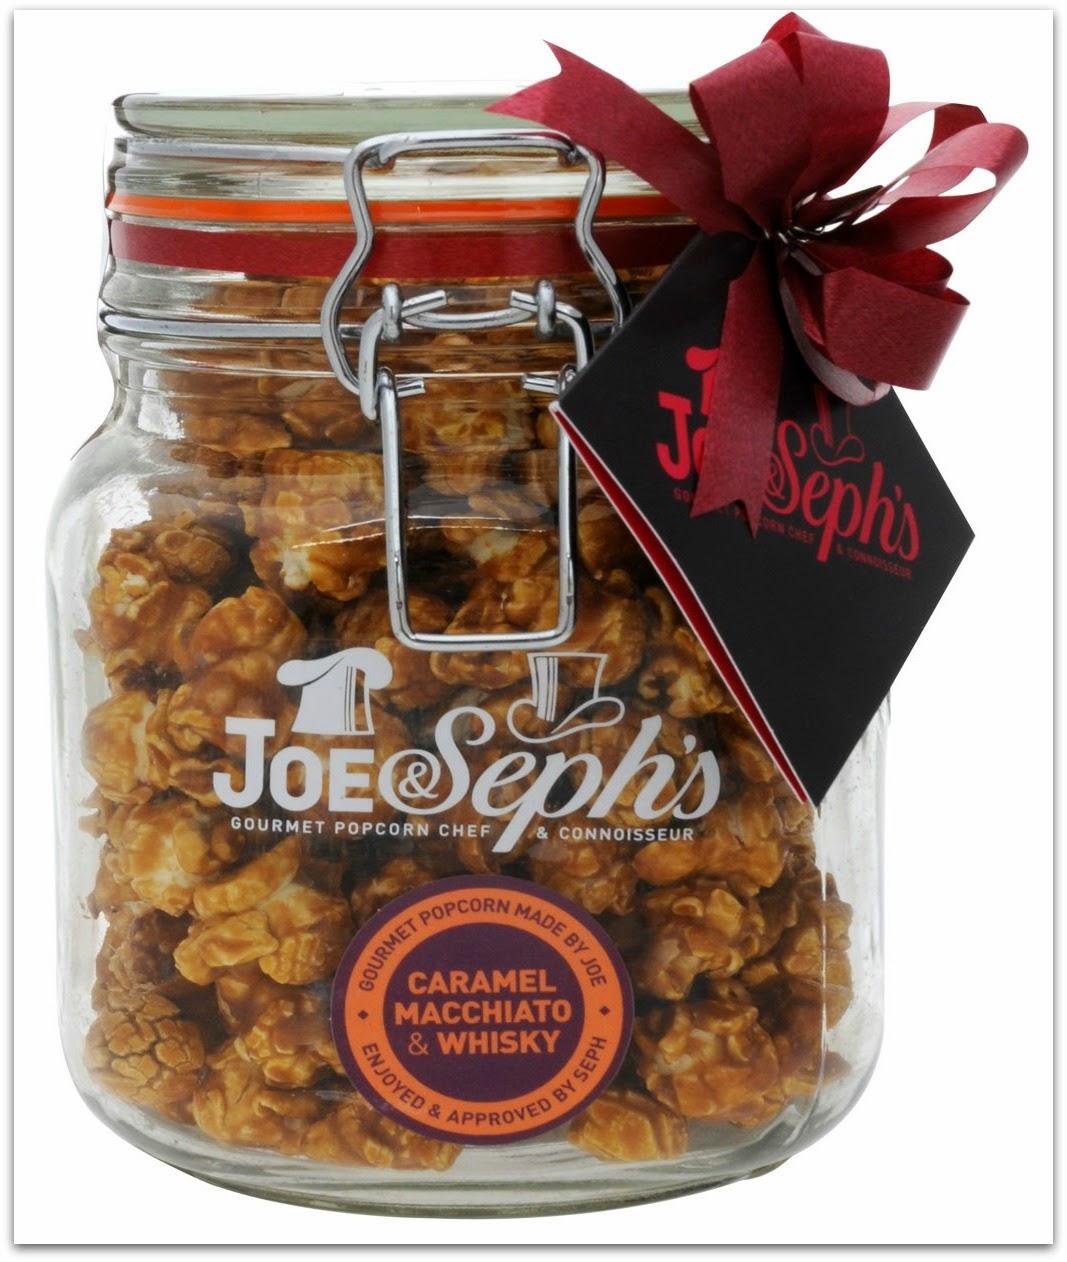 Joe and Seph's popcorn